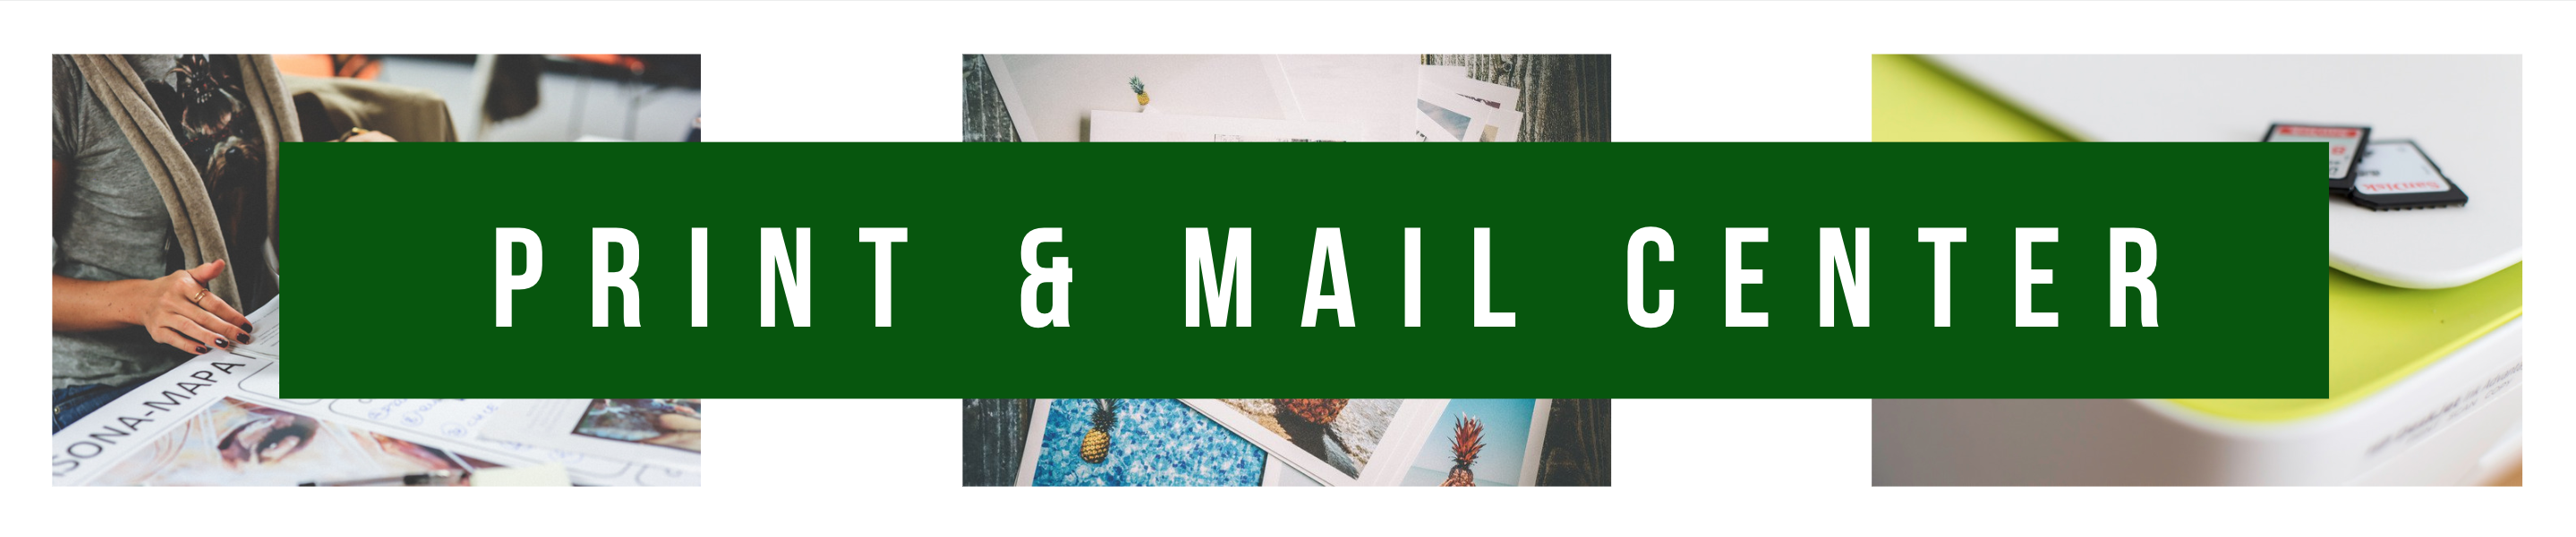 Print & Mail Center